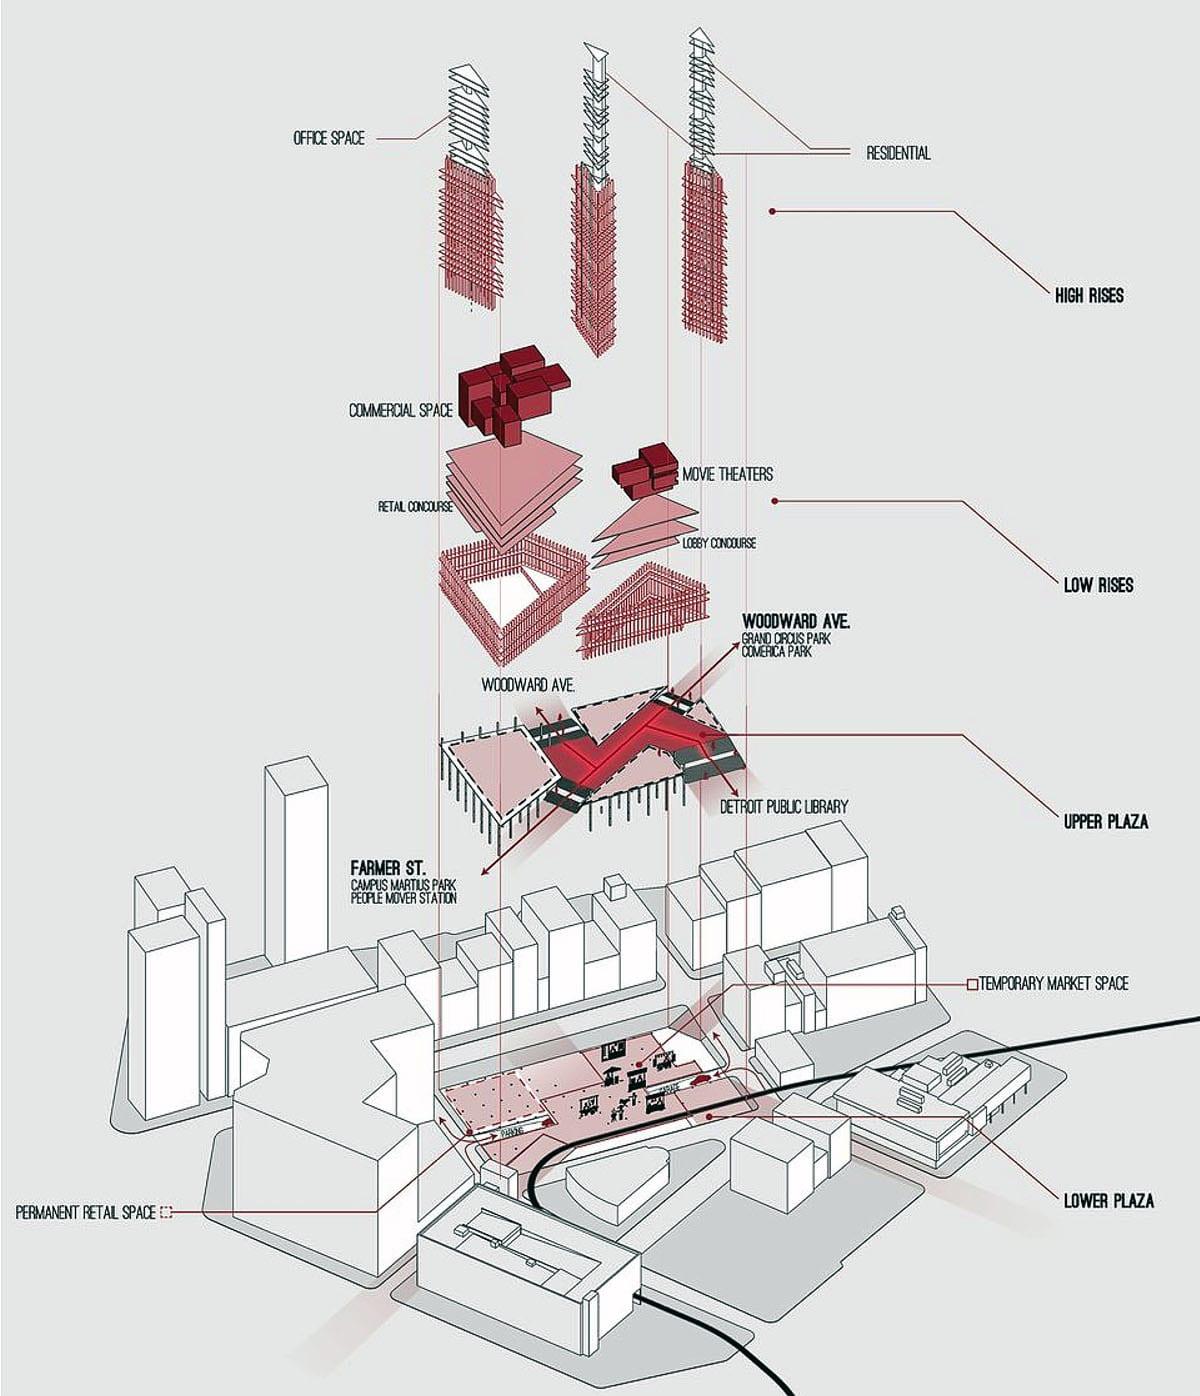 redesigning detroit4 - dropbox